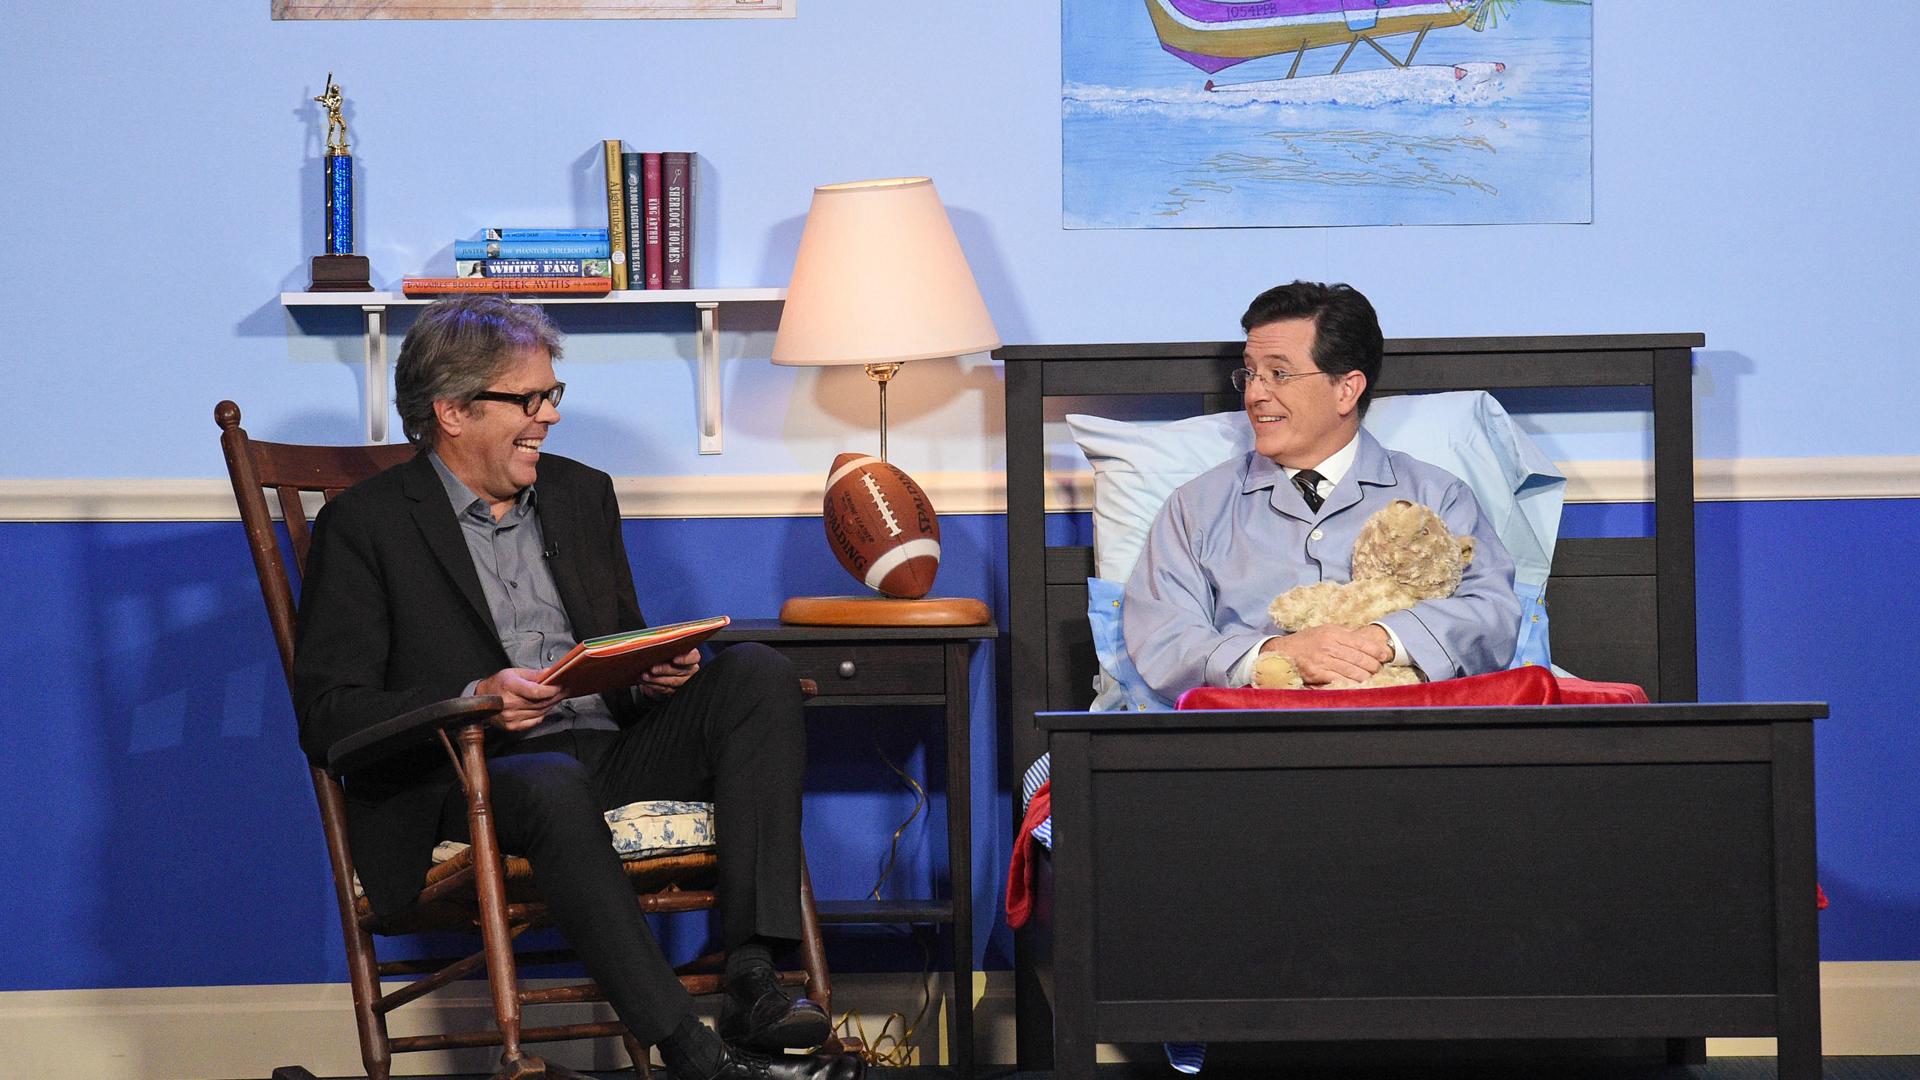 Jonathan Franzen and Stephen Colbert